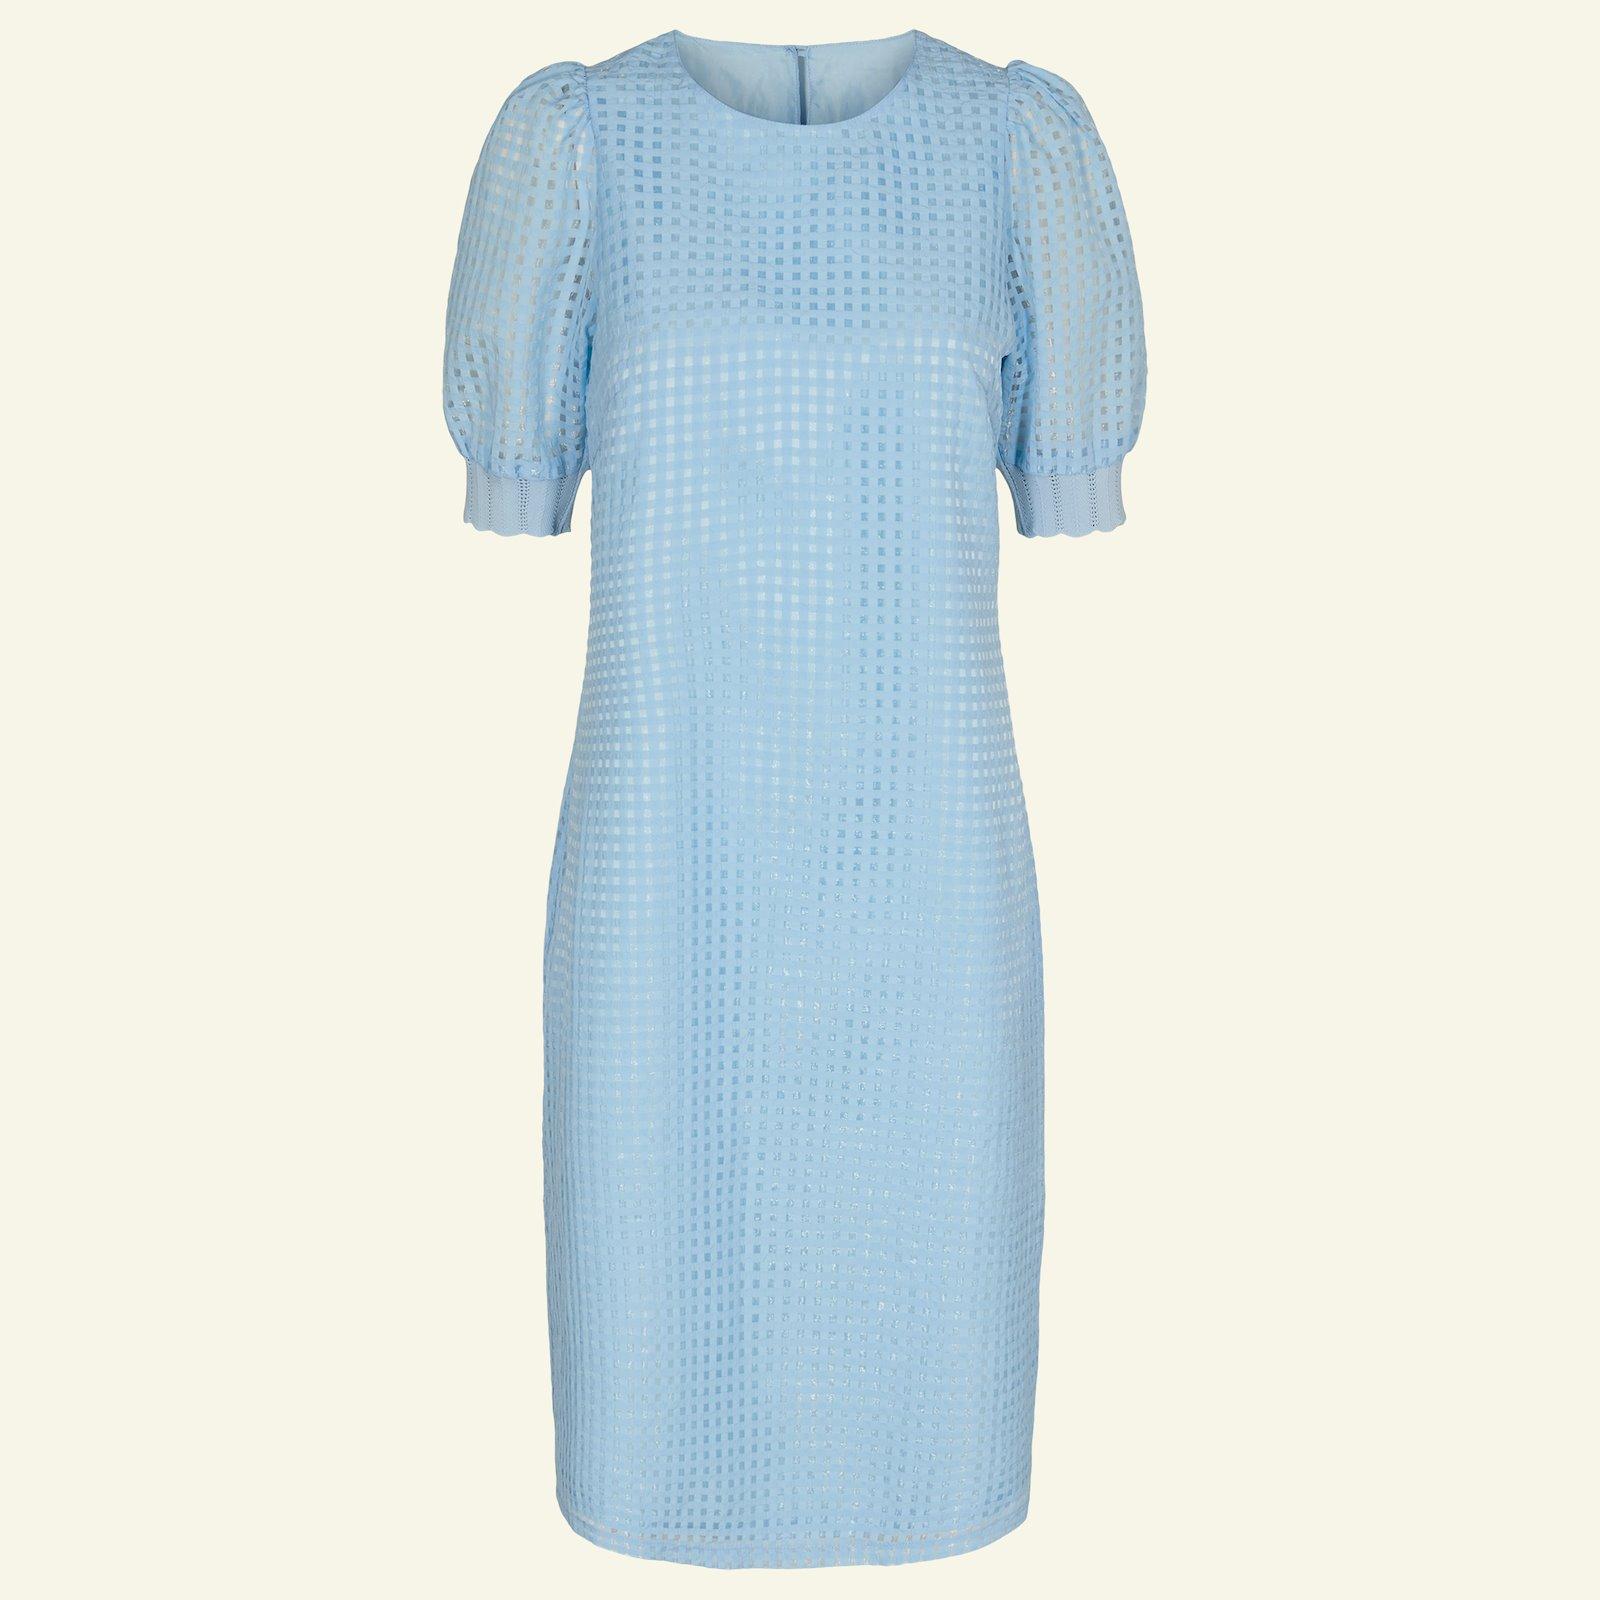 Rib knitted 6x55cm light blue 1pc p23166_631260_96136_sskit